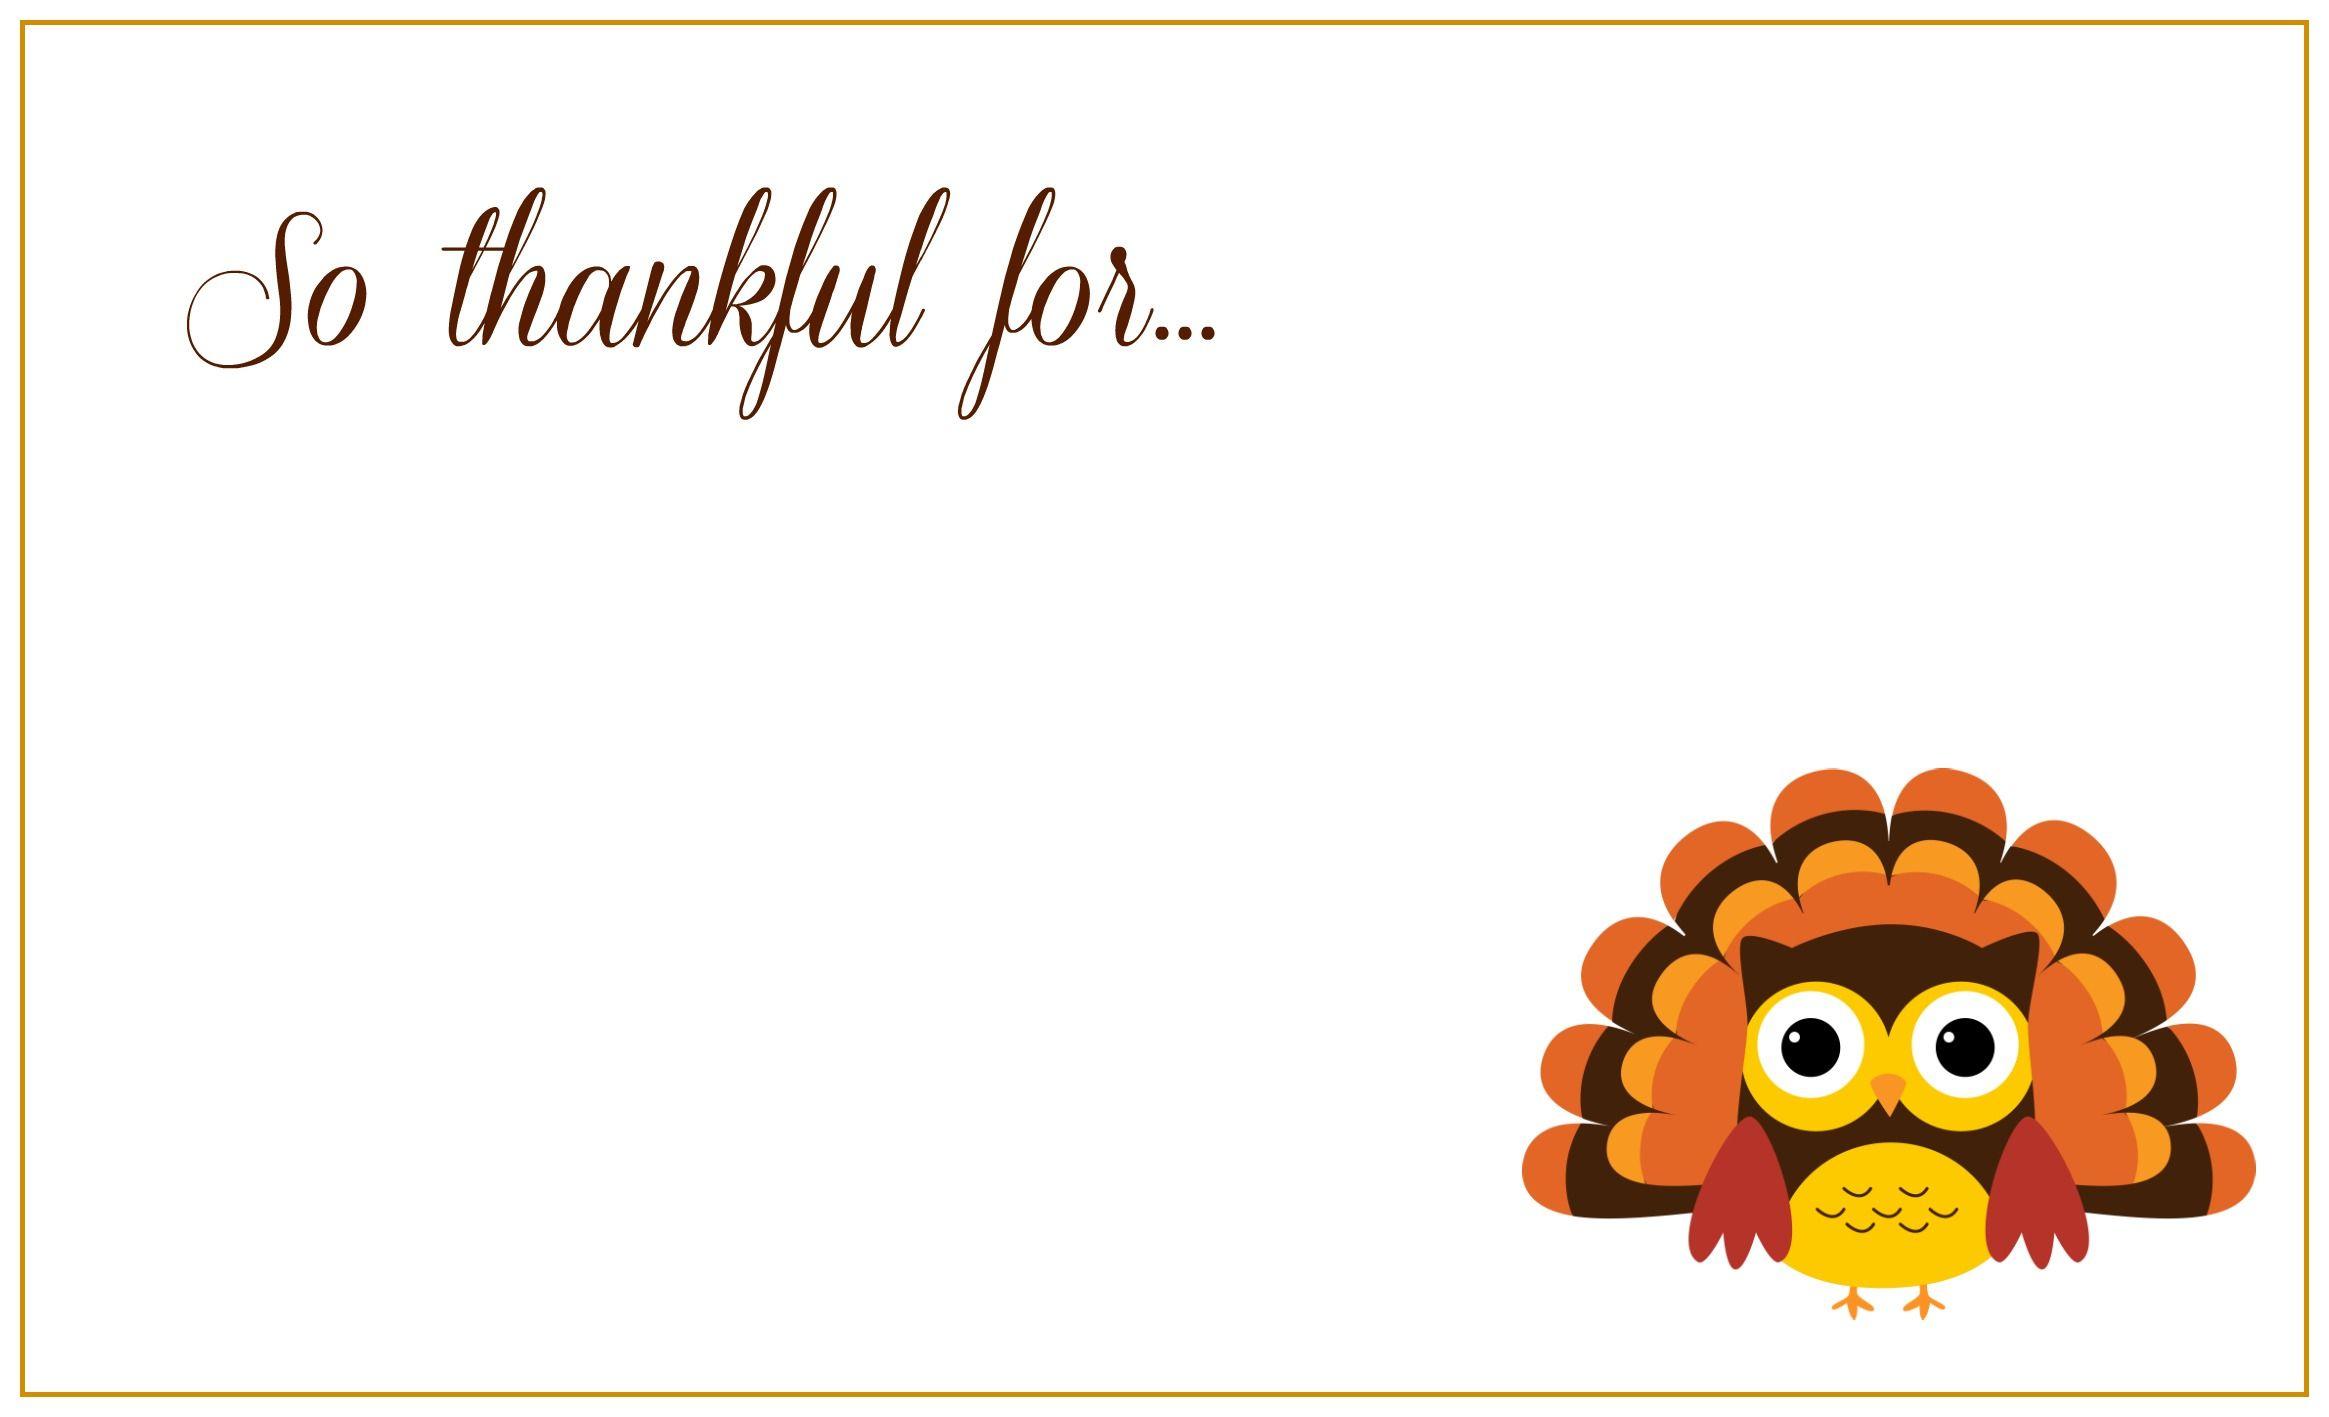 Free Printable Thanksgiving Greeting Cards | Thanksgiving Day - Happy Thanksgiving Cards Free Printable